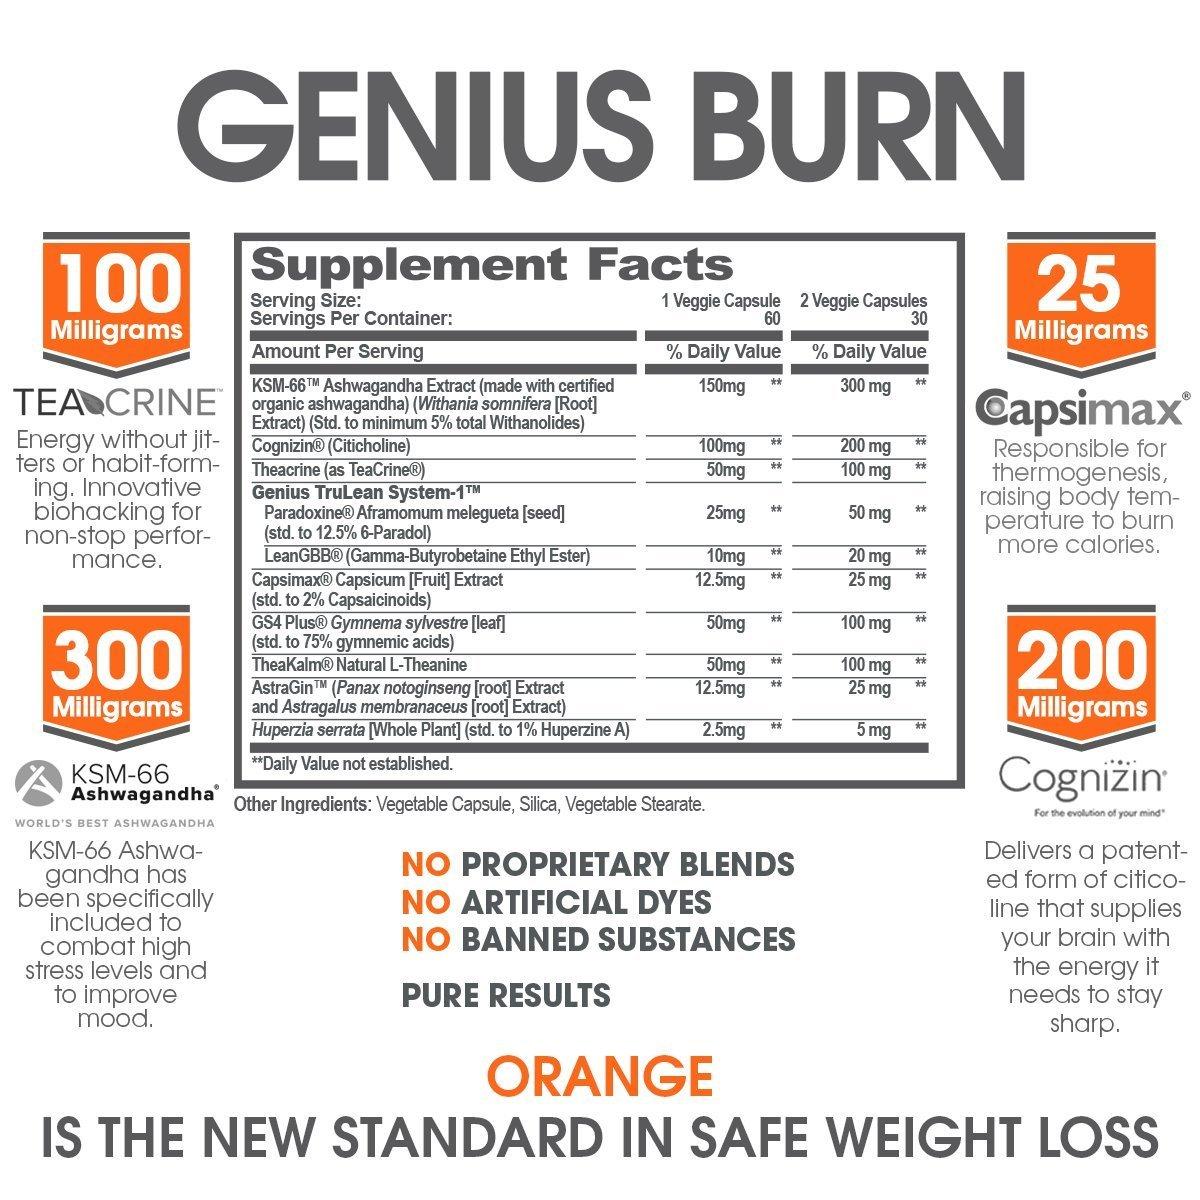 Genius Burn: Smart and Trusted Caffeine-Free Fat Loss